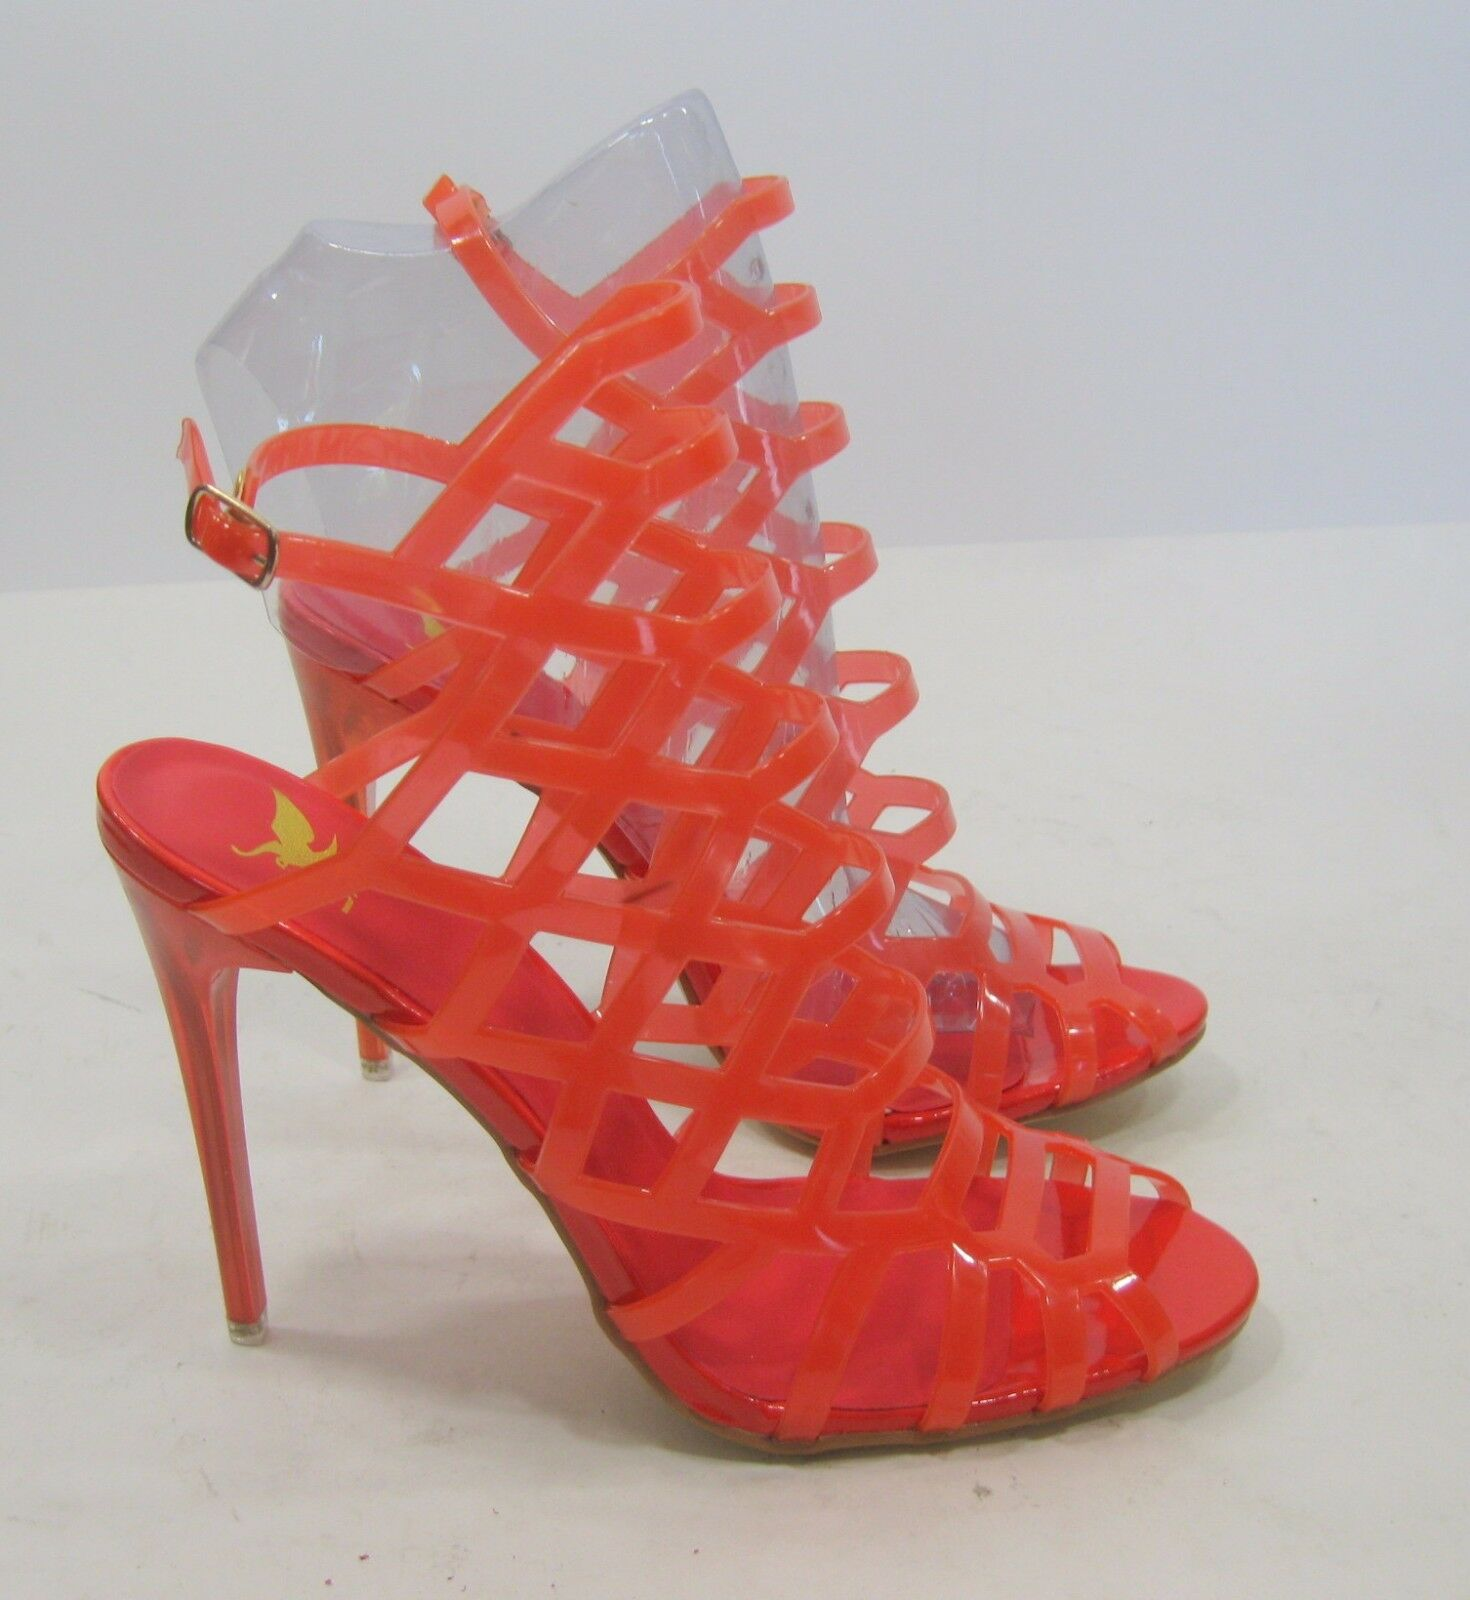 New ladies orange 4.5 Stiletto High Heel Peep Toe Womens Stunning Sandal Size 6